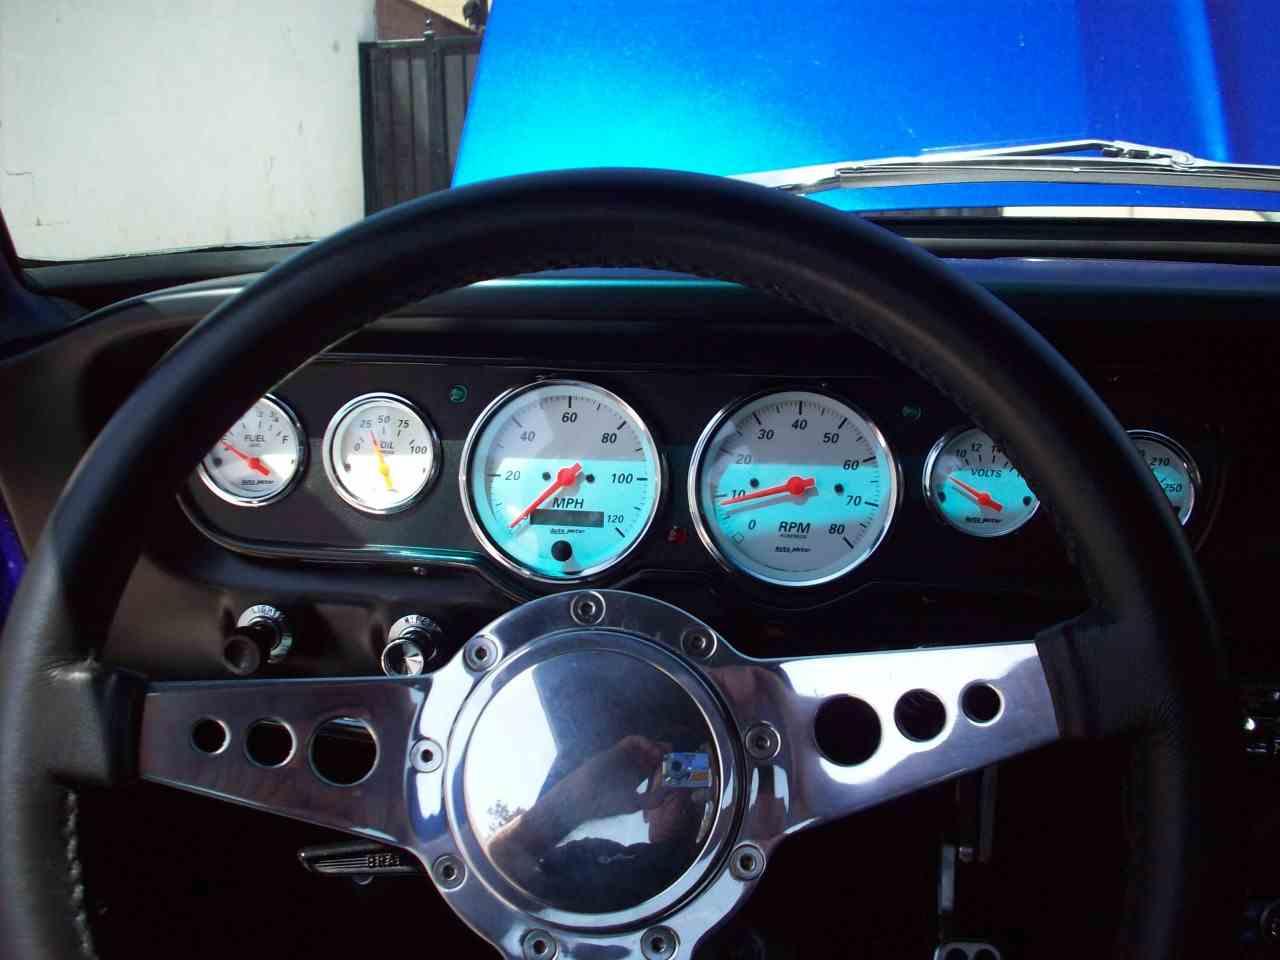 Future Ford Of Sacramento >> 1964 Ford Ranchero for Sale | ClassicCars.com | CC-547293